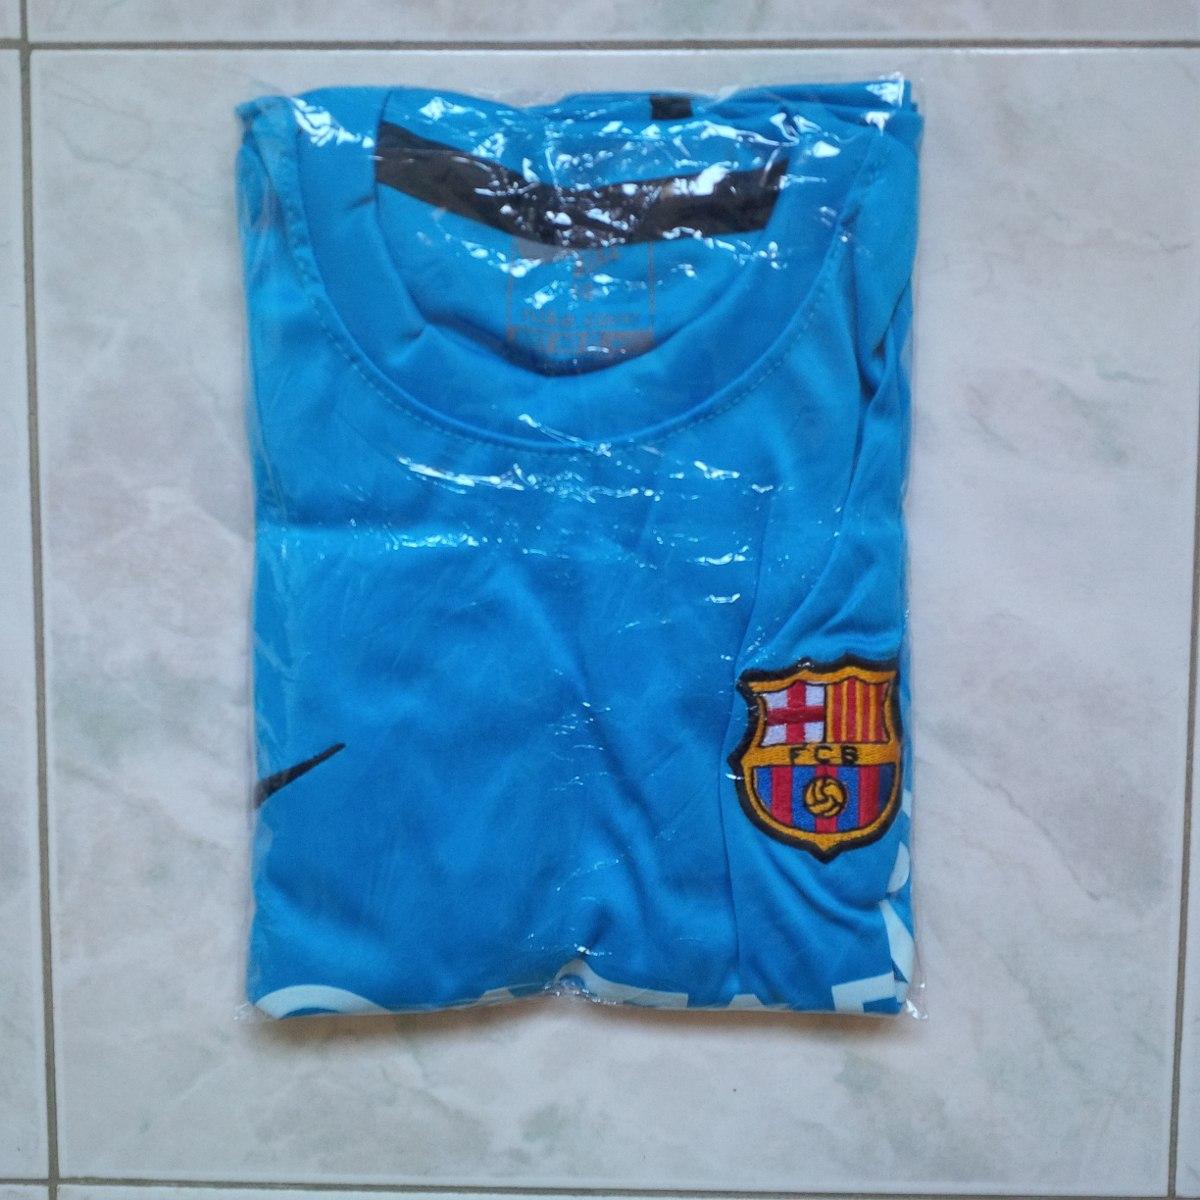 uniforme barcelona fc azul celeste 2016 estampado messi niño. Cargando zoom. 7411869d4a8